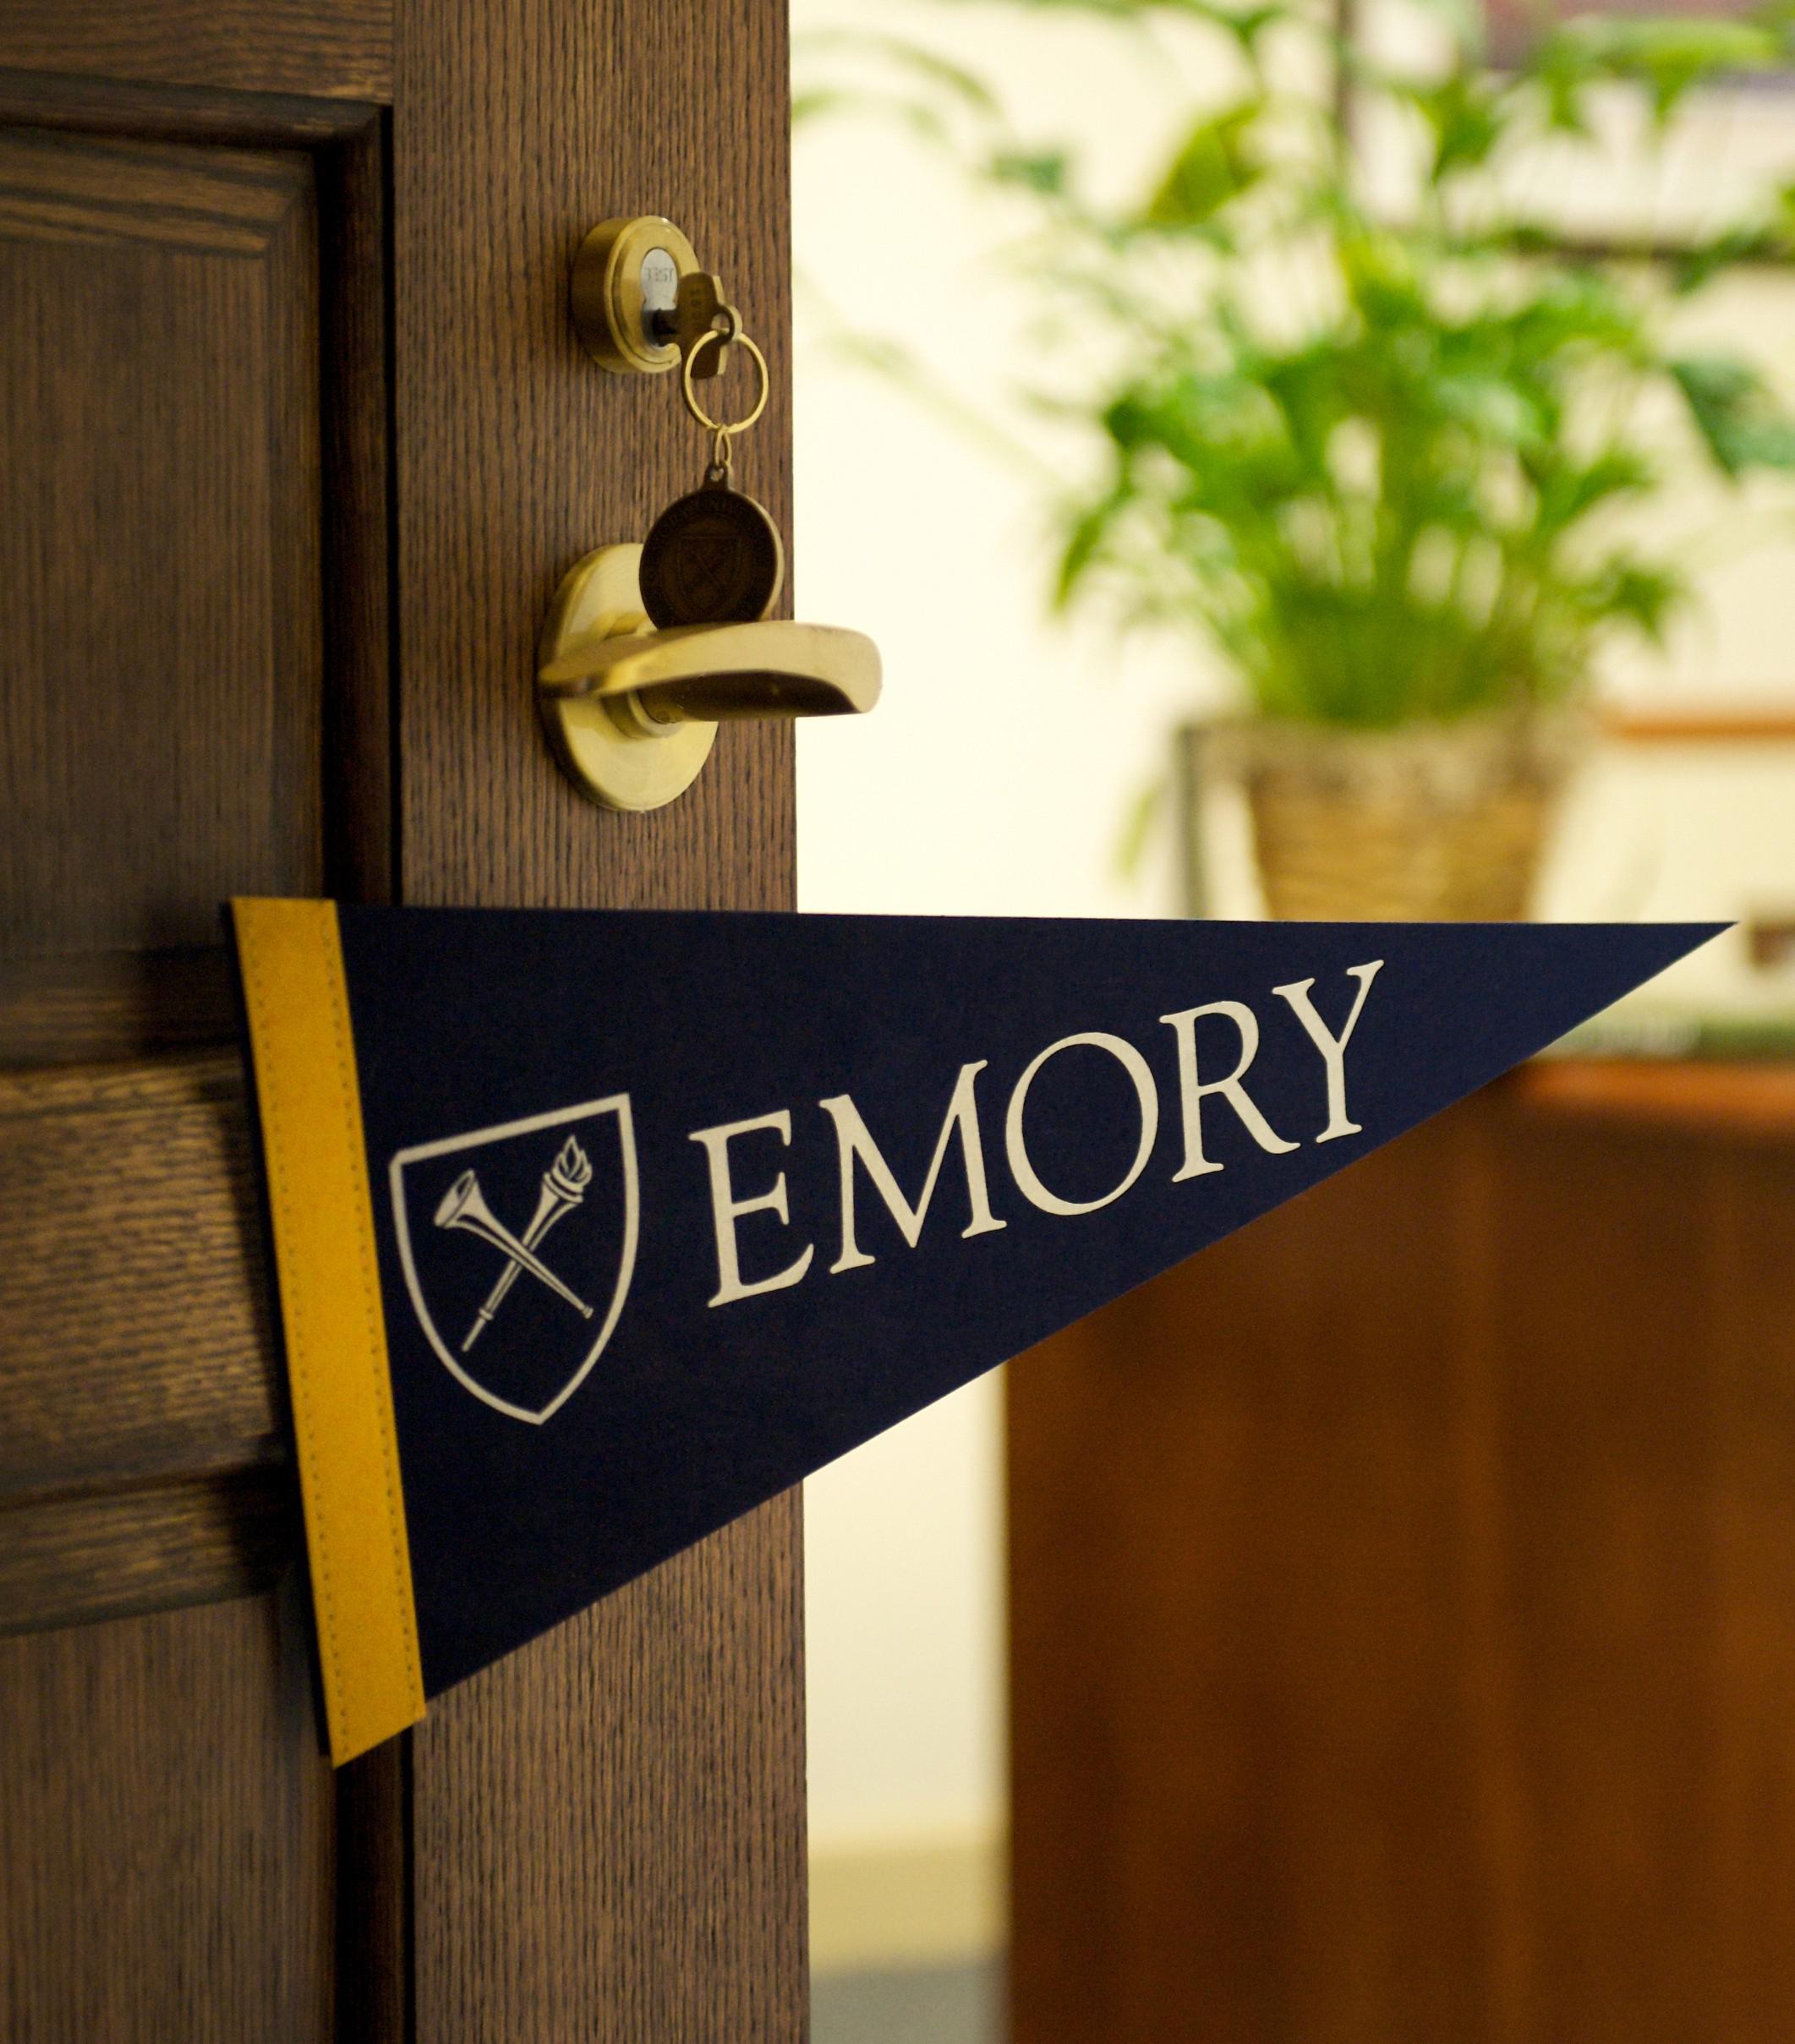 emory university nursing admissions essay